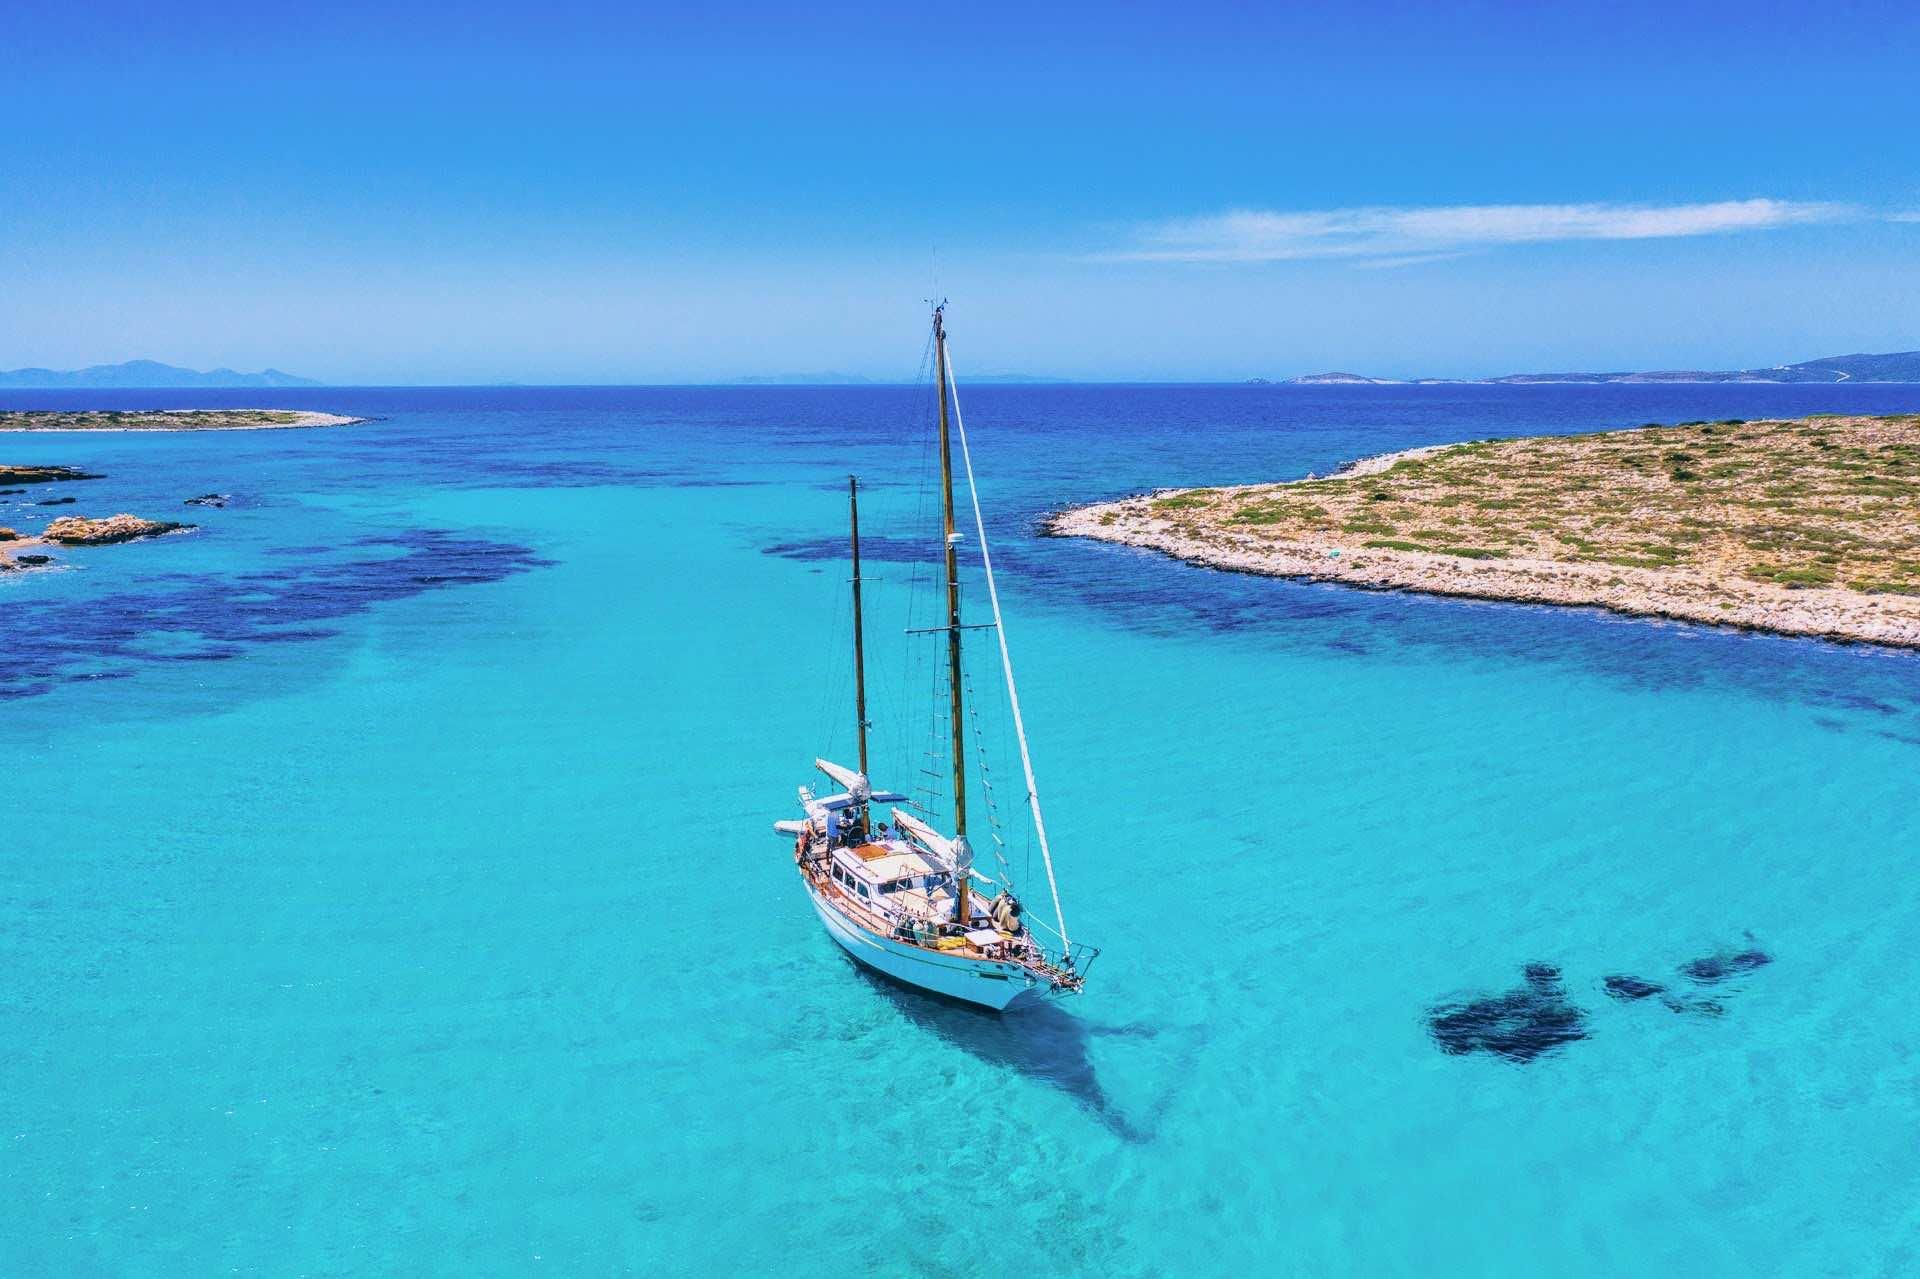 Weeklong beach vibes in Paros & Antiparos